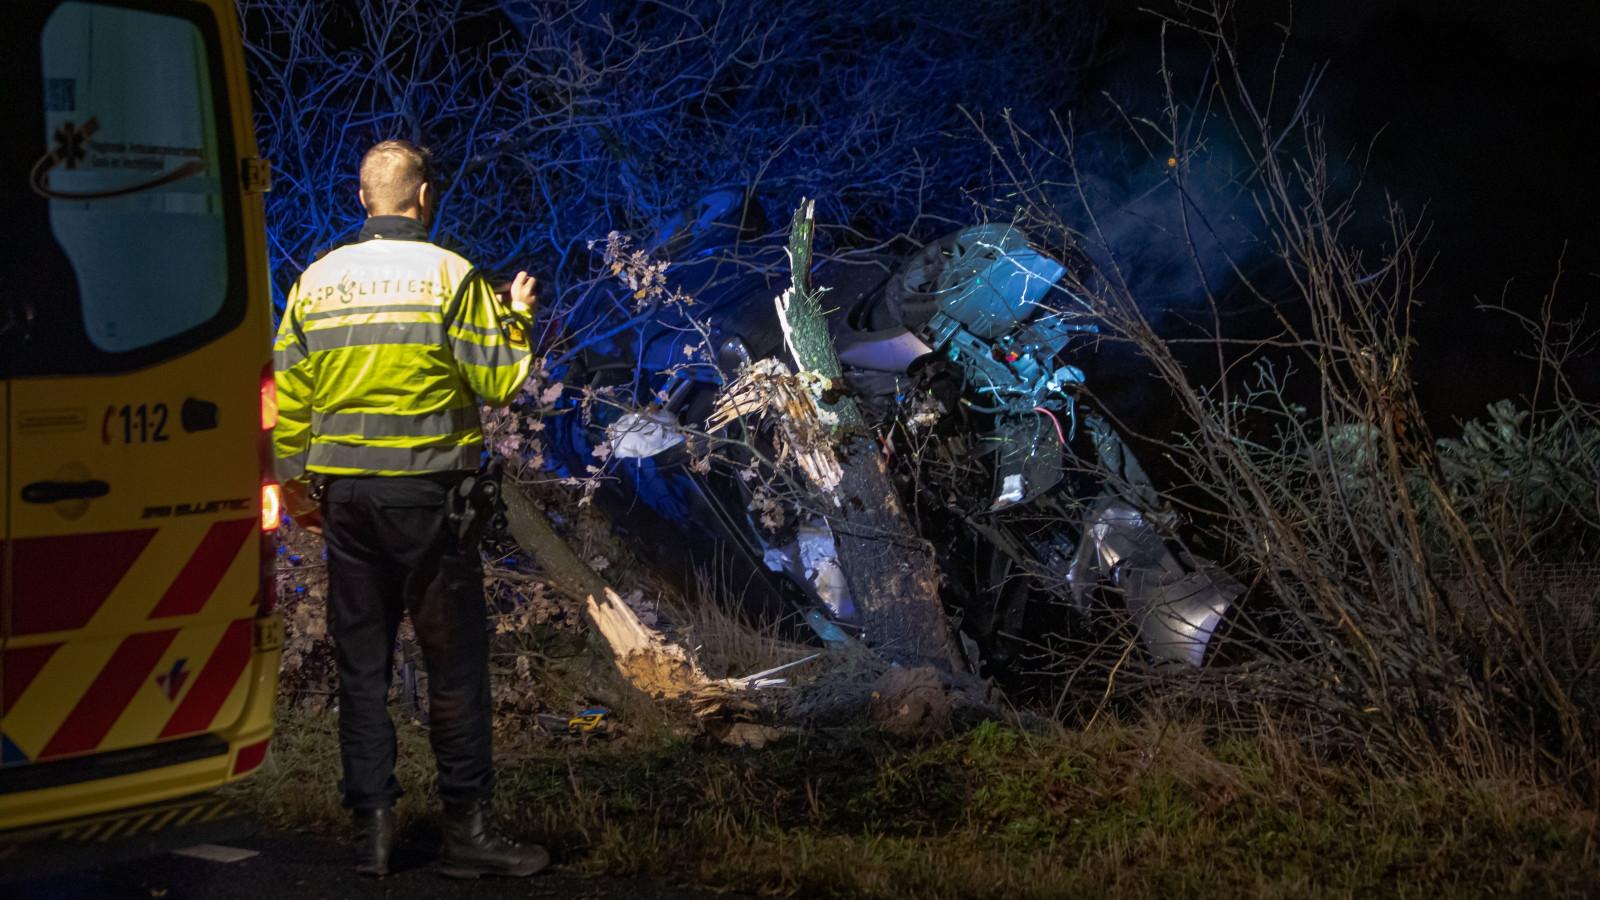 Zwaar ongeluk in Bussum: bestuurder ernstig gewond.